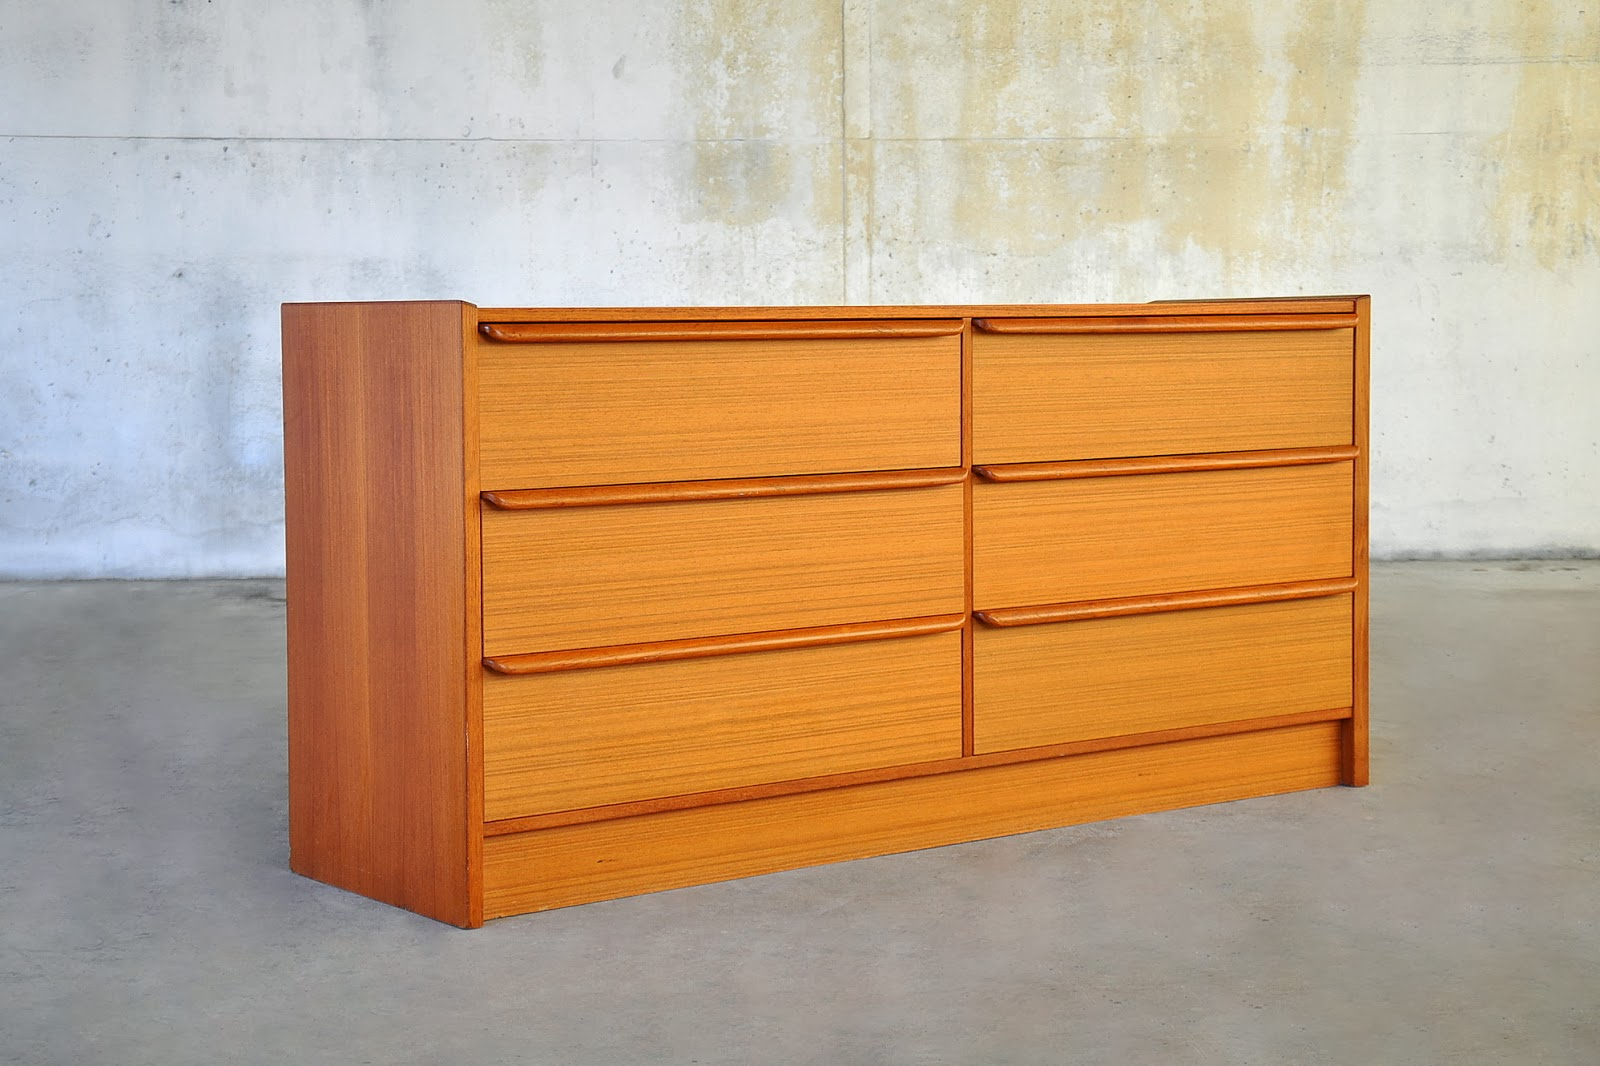 Danish Teak Dresser Bestdressers 2019